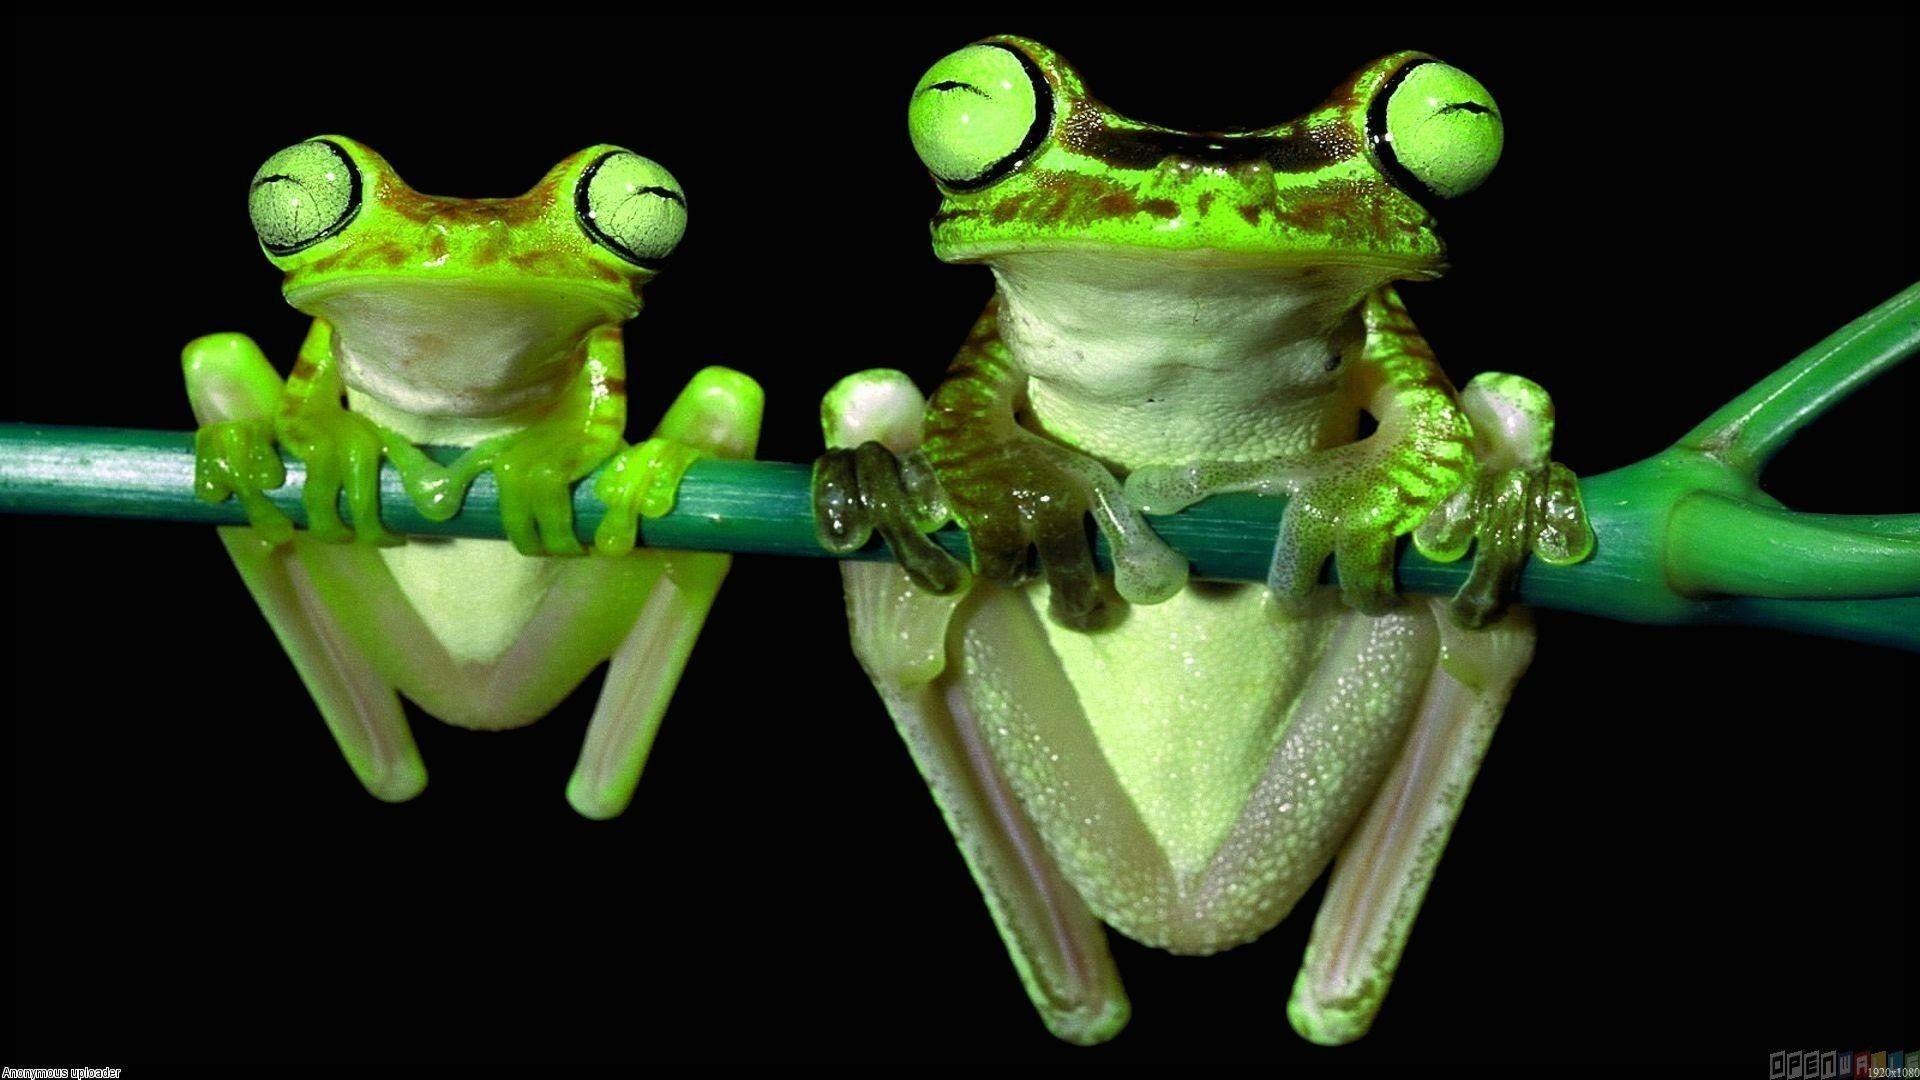 Cute Frog Wallpaper Background For Desktop Wallpaper 1920 x 1080 px 623.08  KB clipart blue cartoon